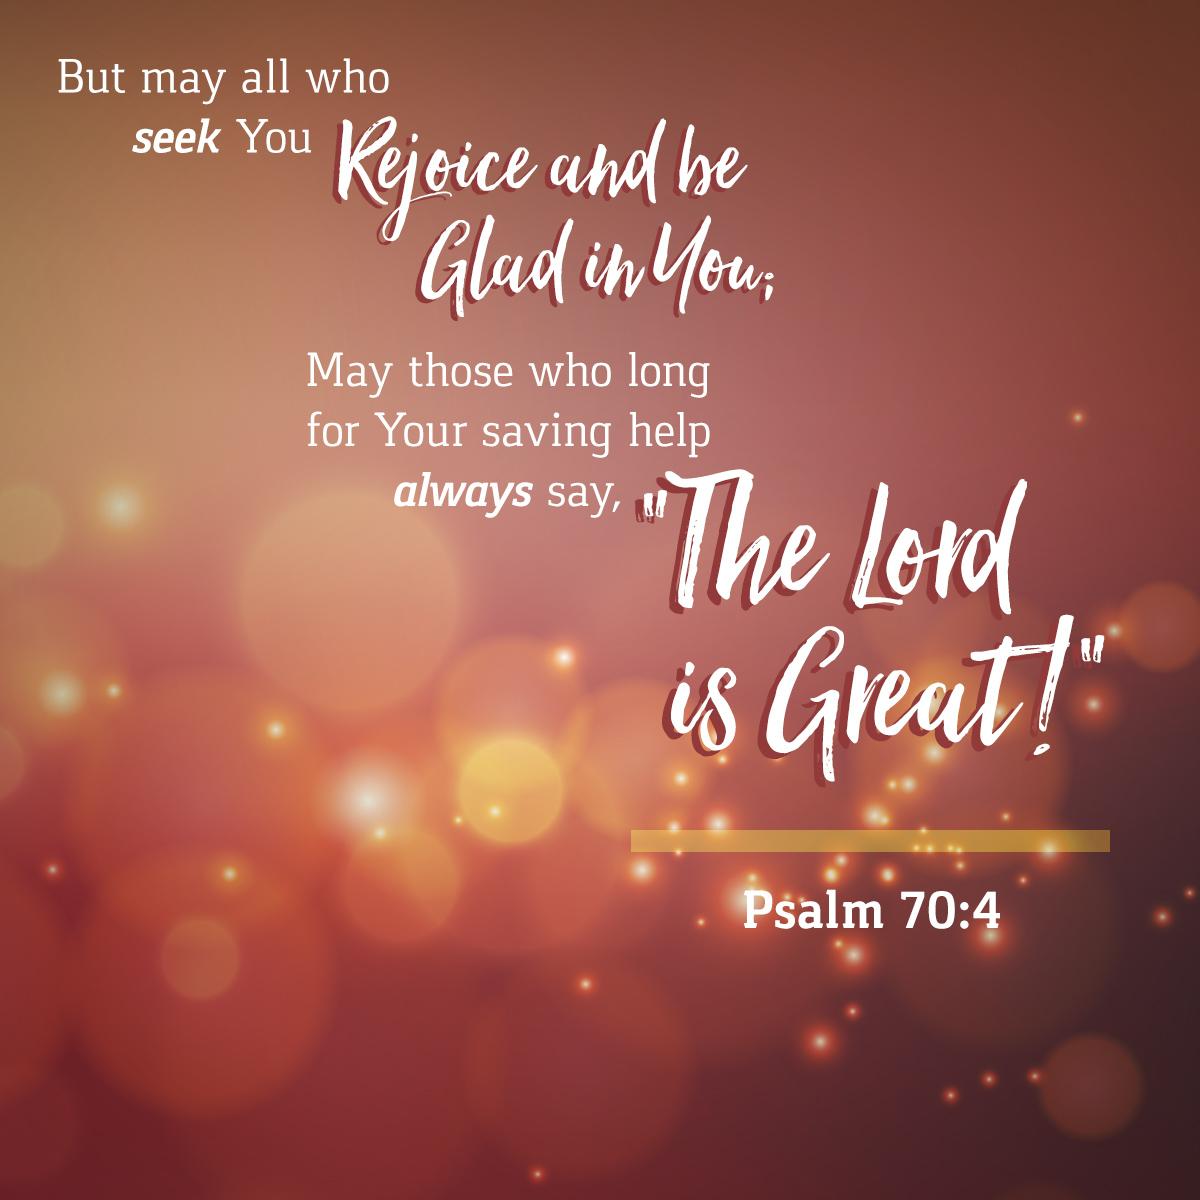 Psalm 70:4